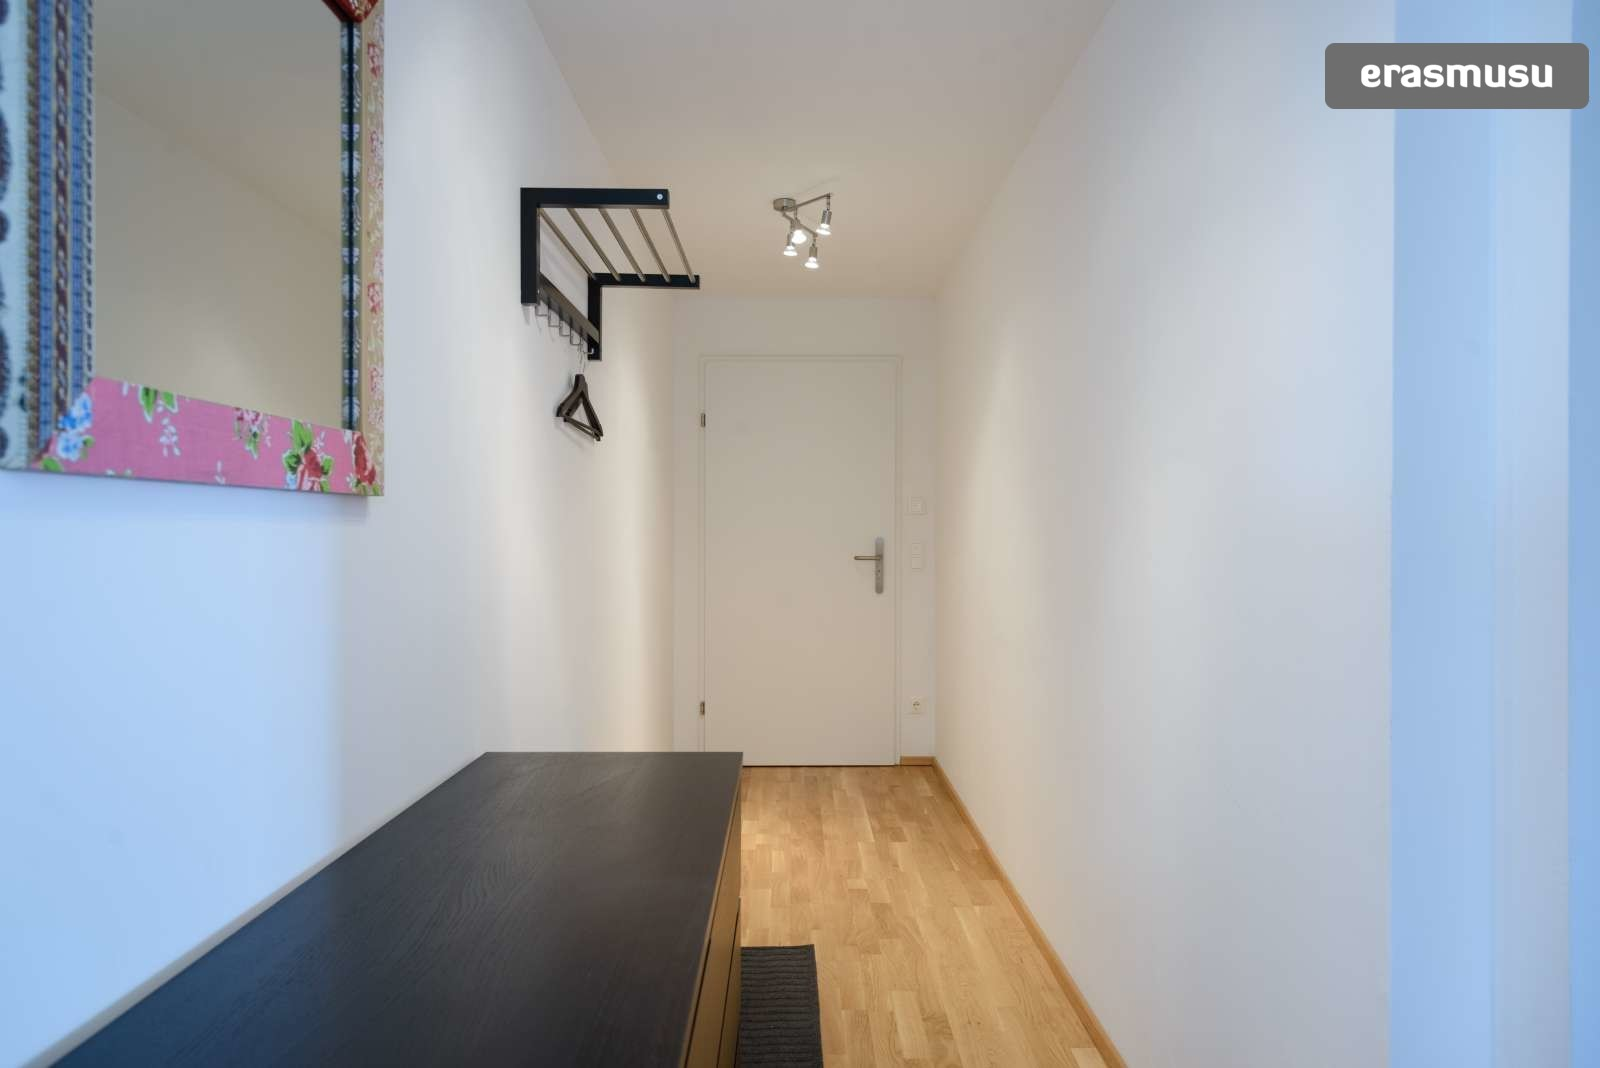 spacious-studio-apartment-rent-aspern-area-donaustadt-988a26752a